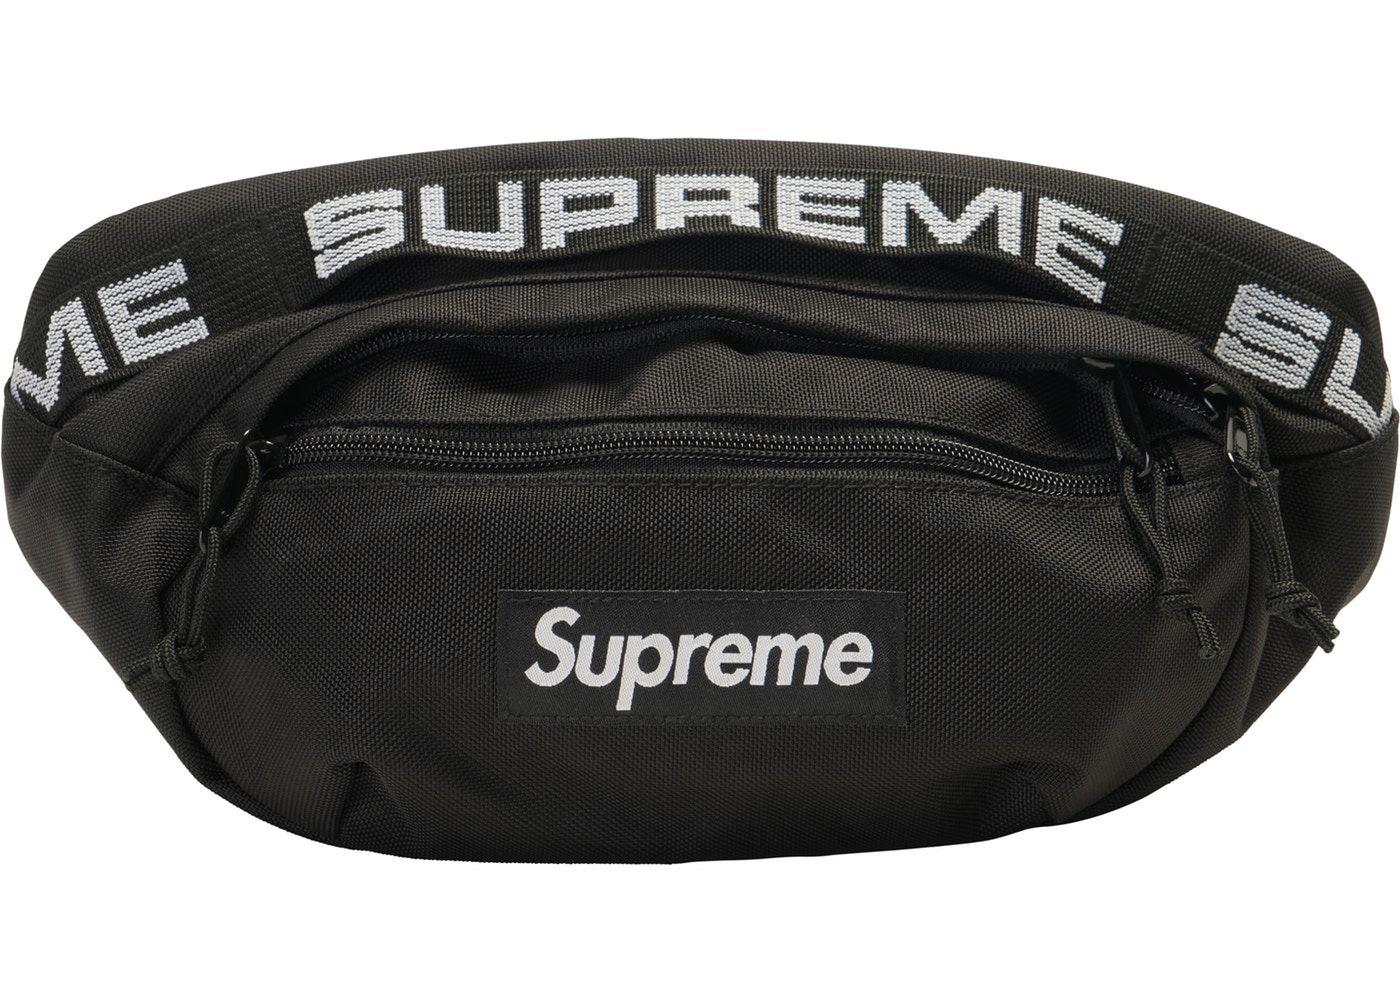 7a29bad37e Supreme Waist Bag (SS18) Black in 2019 | g | Supreme bag, Bags ...